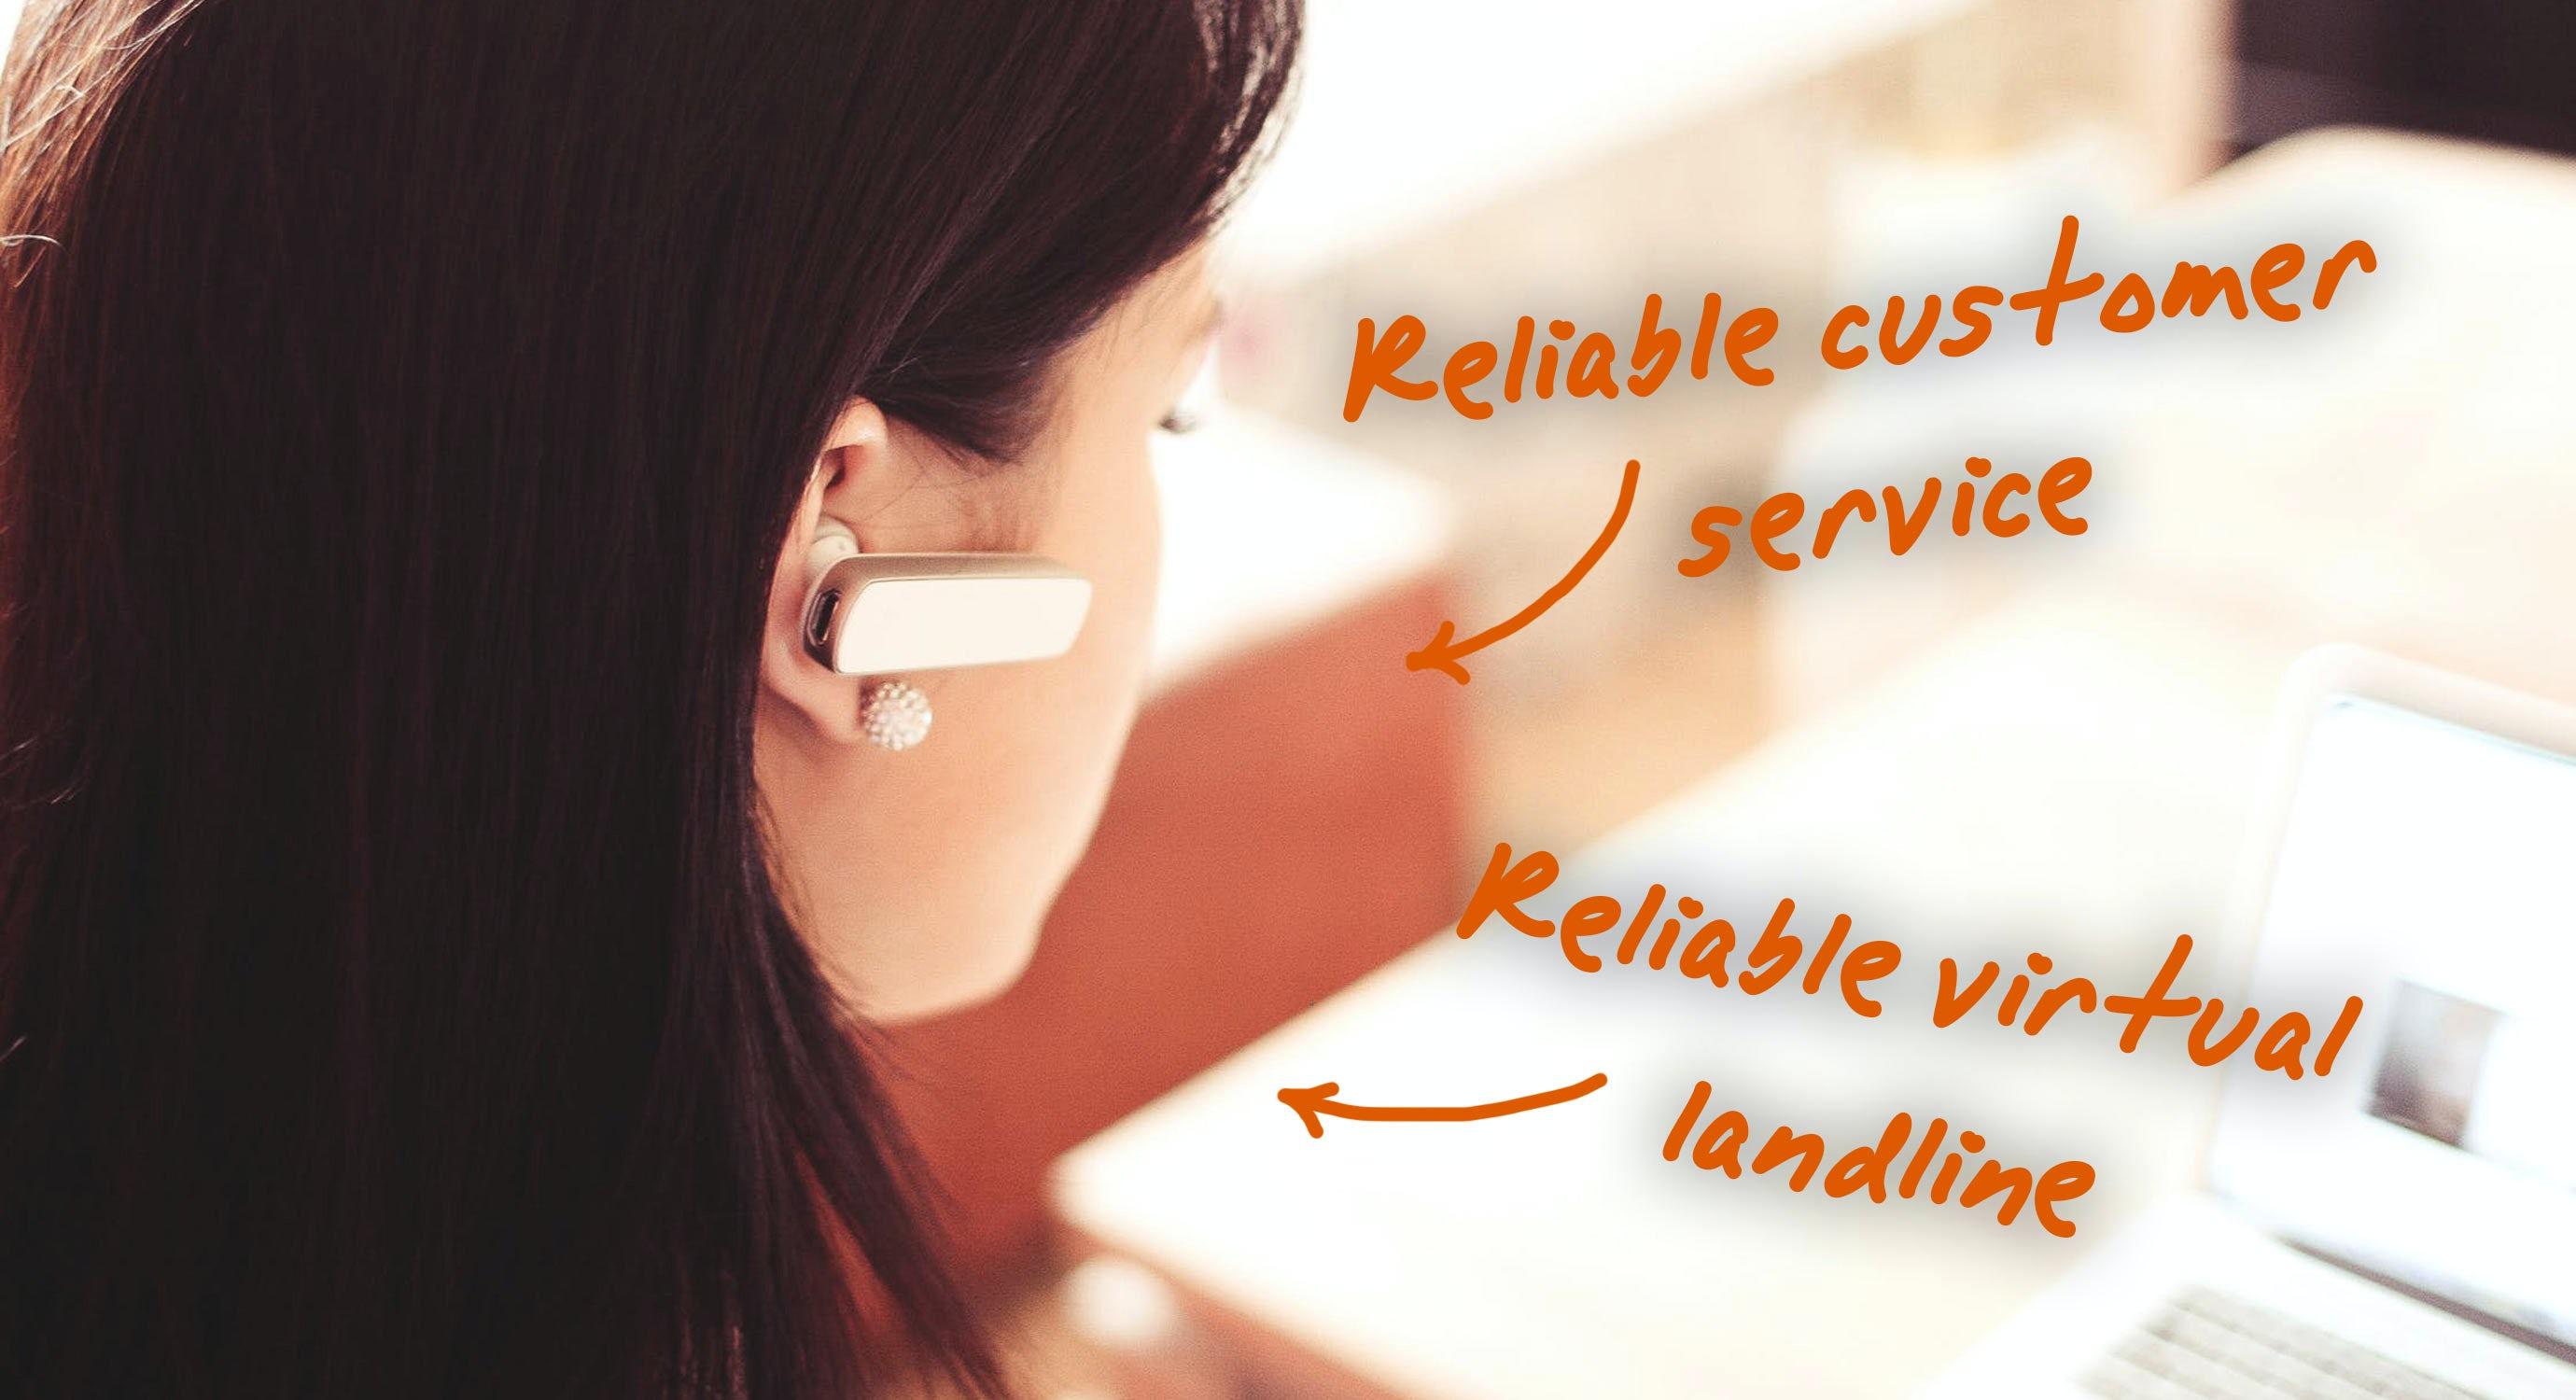 customer service using virtual number